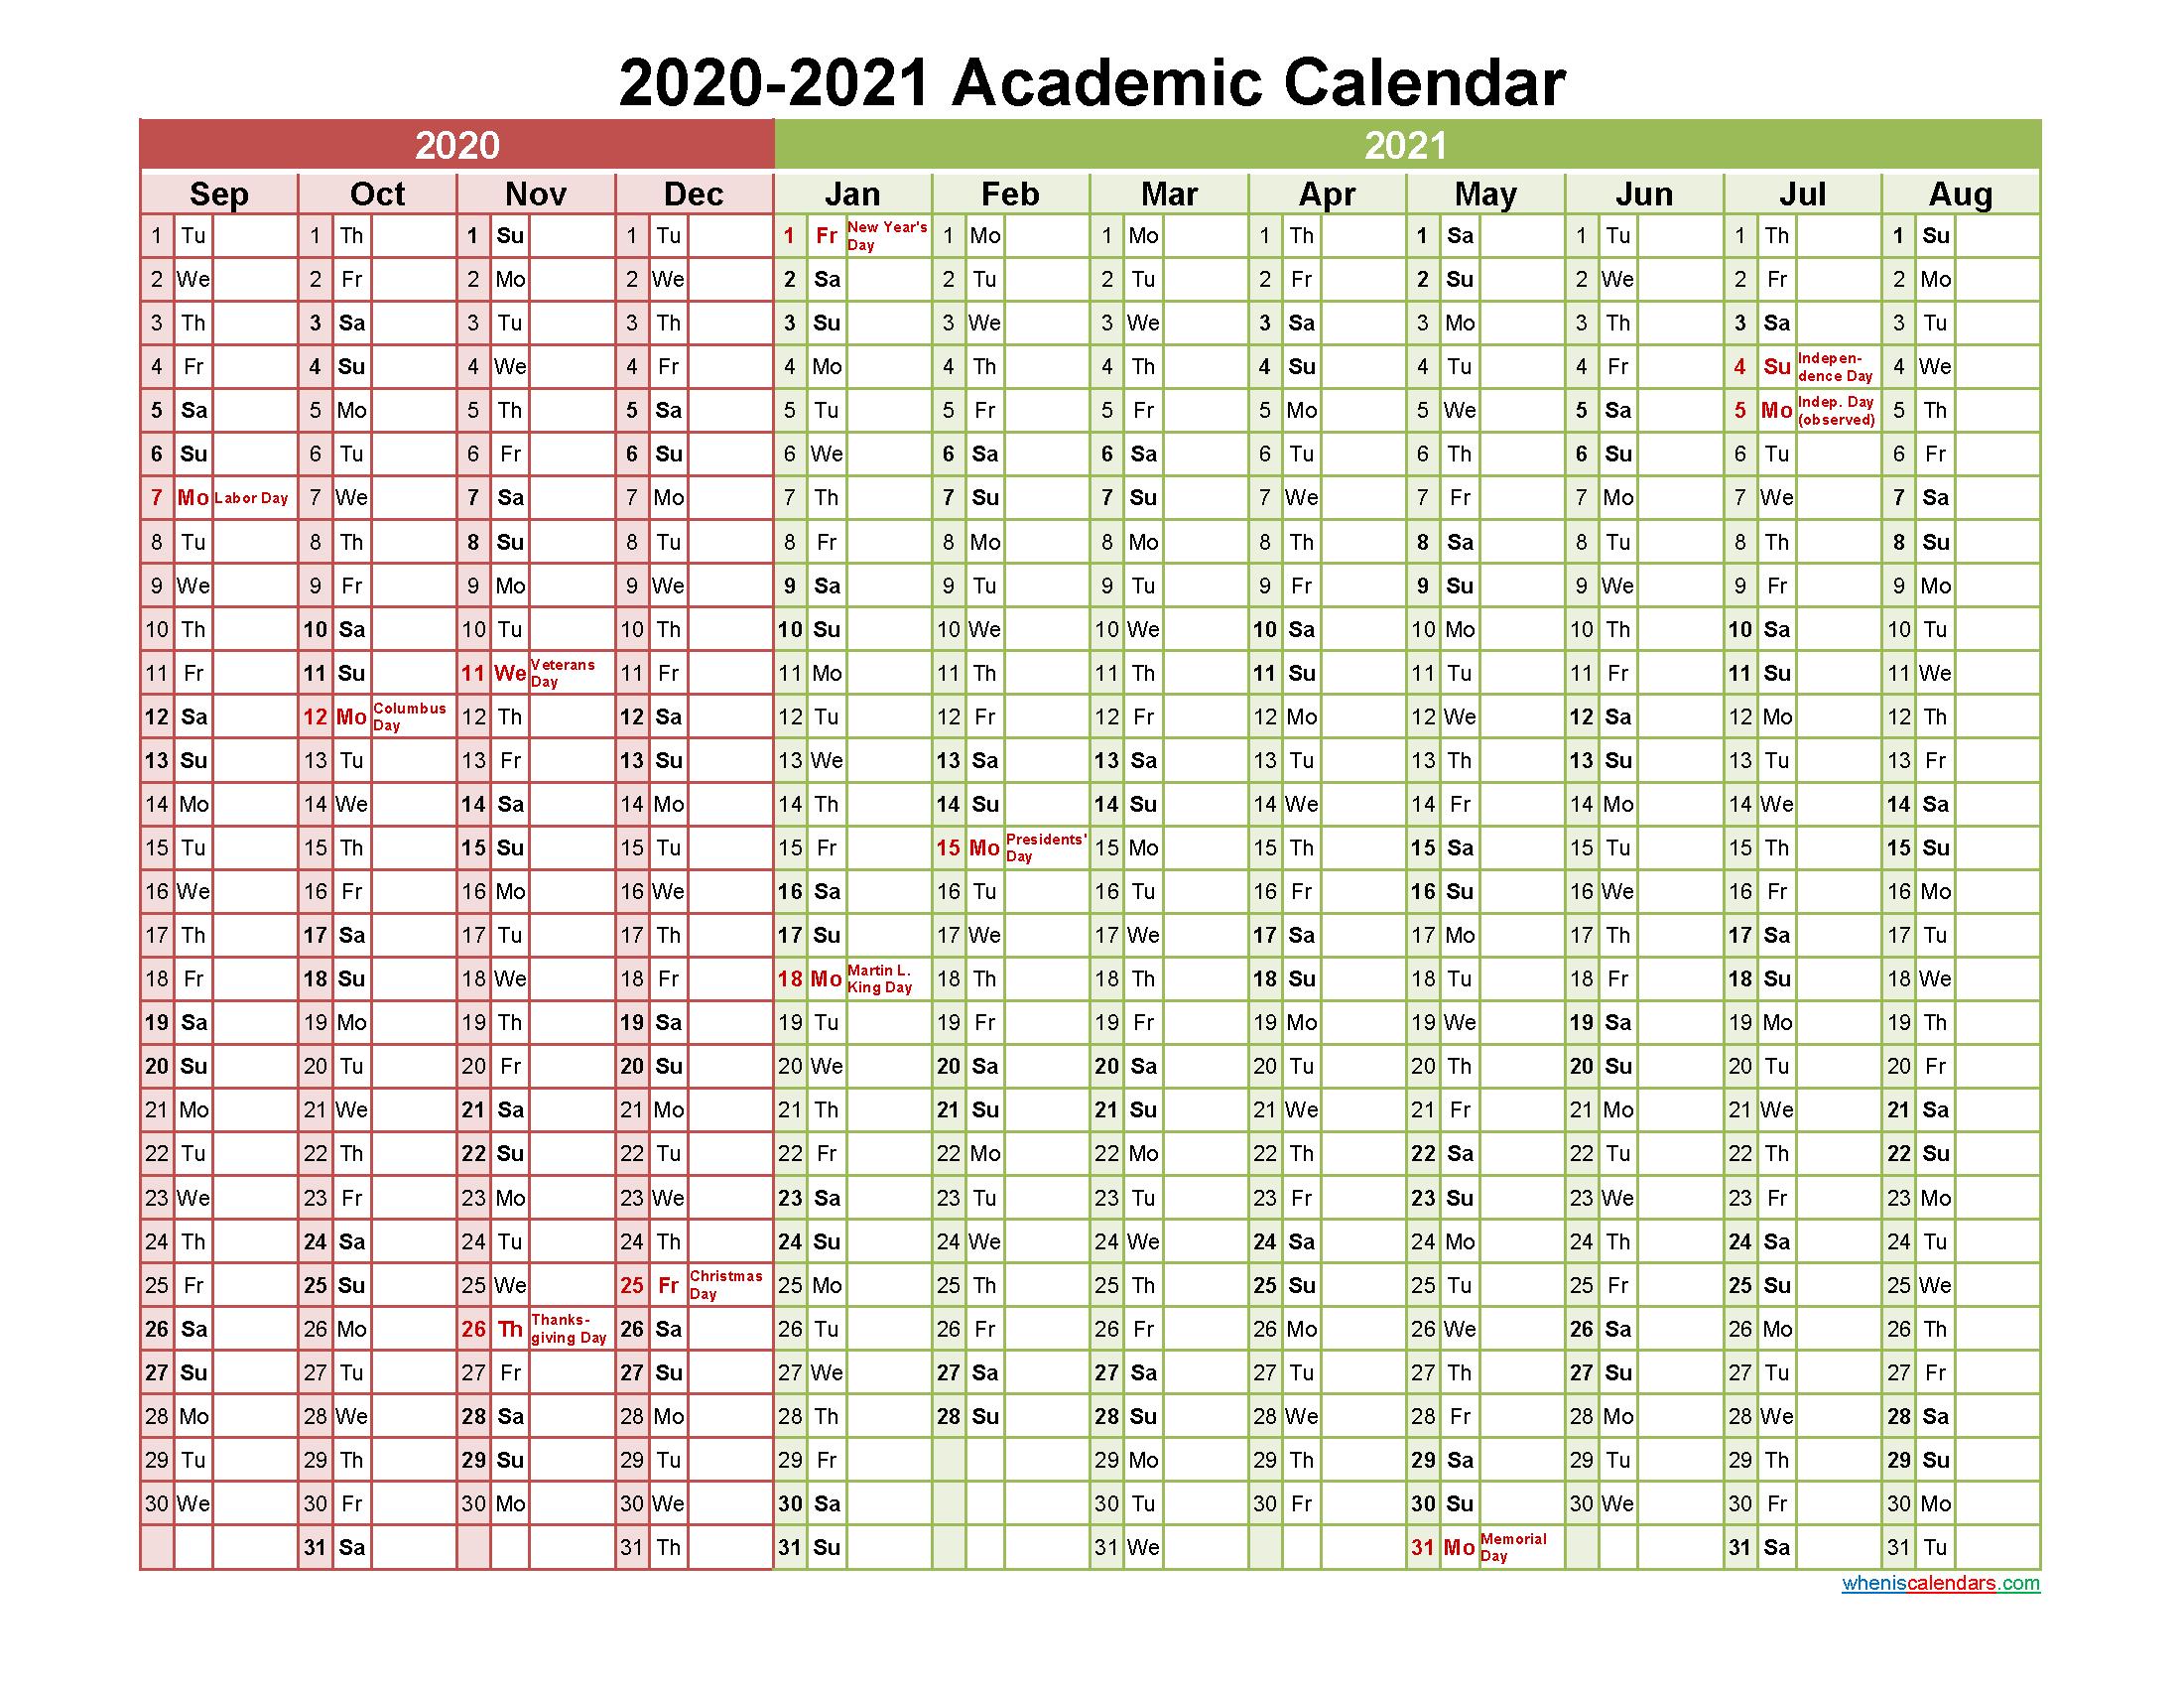 Academic Calendar 2020 And 2021 Printable (Landscape